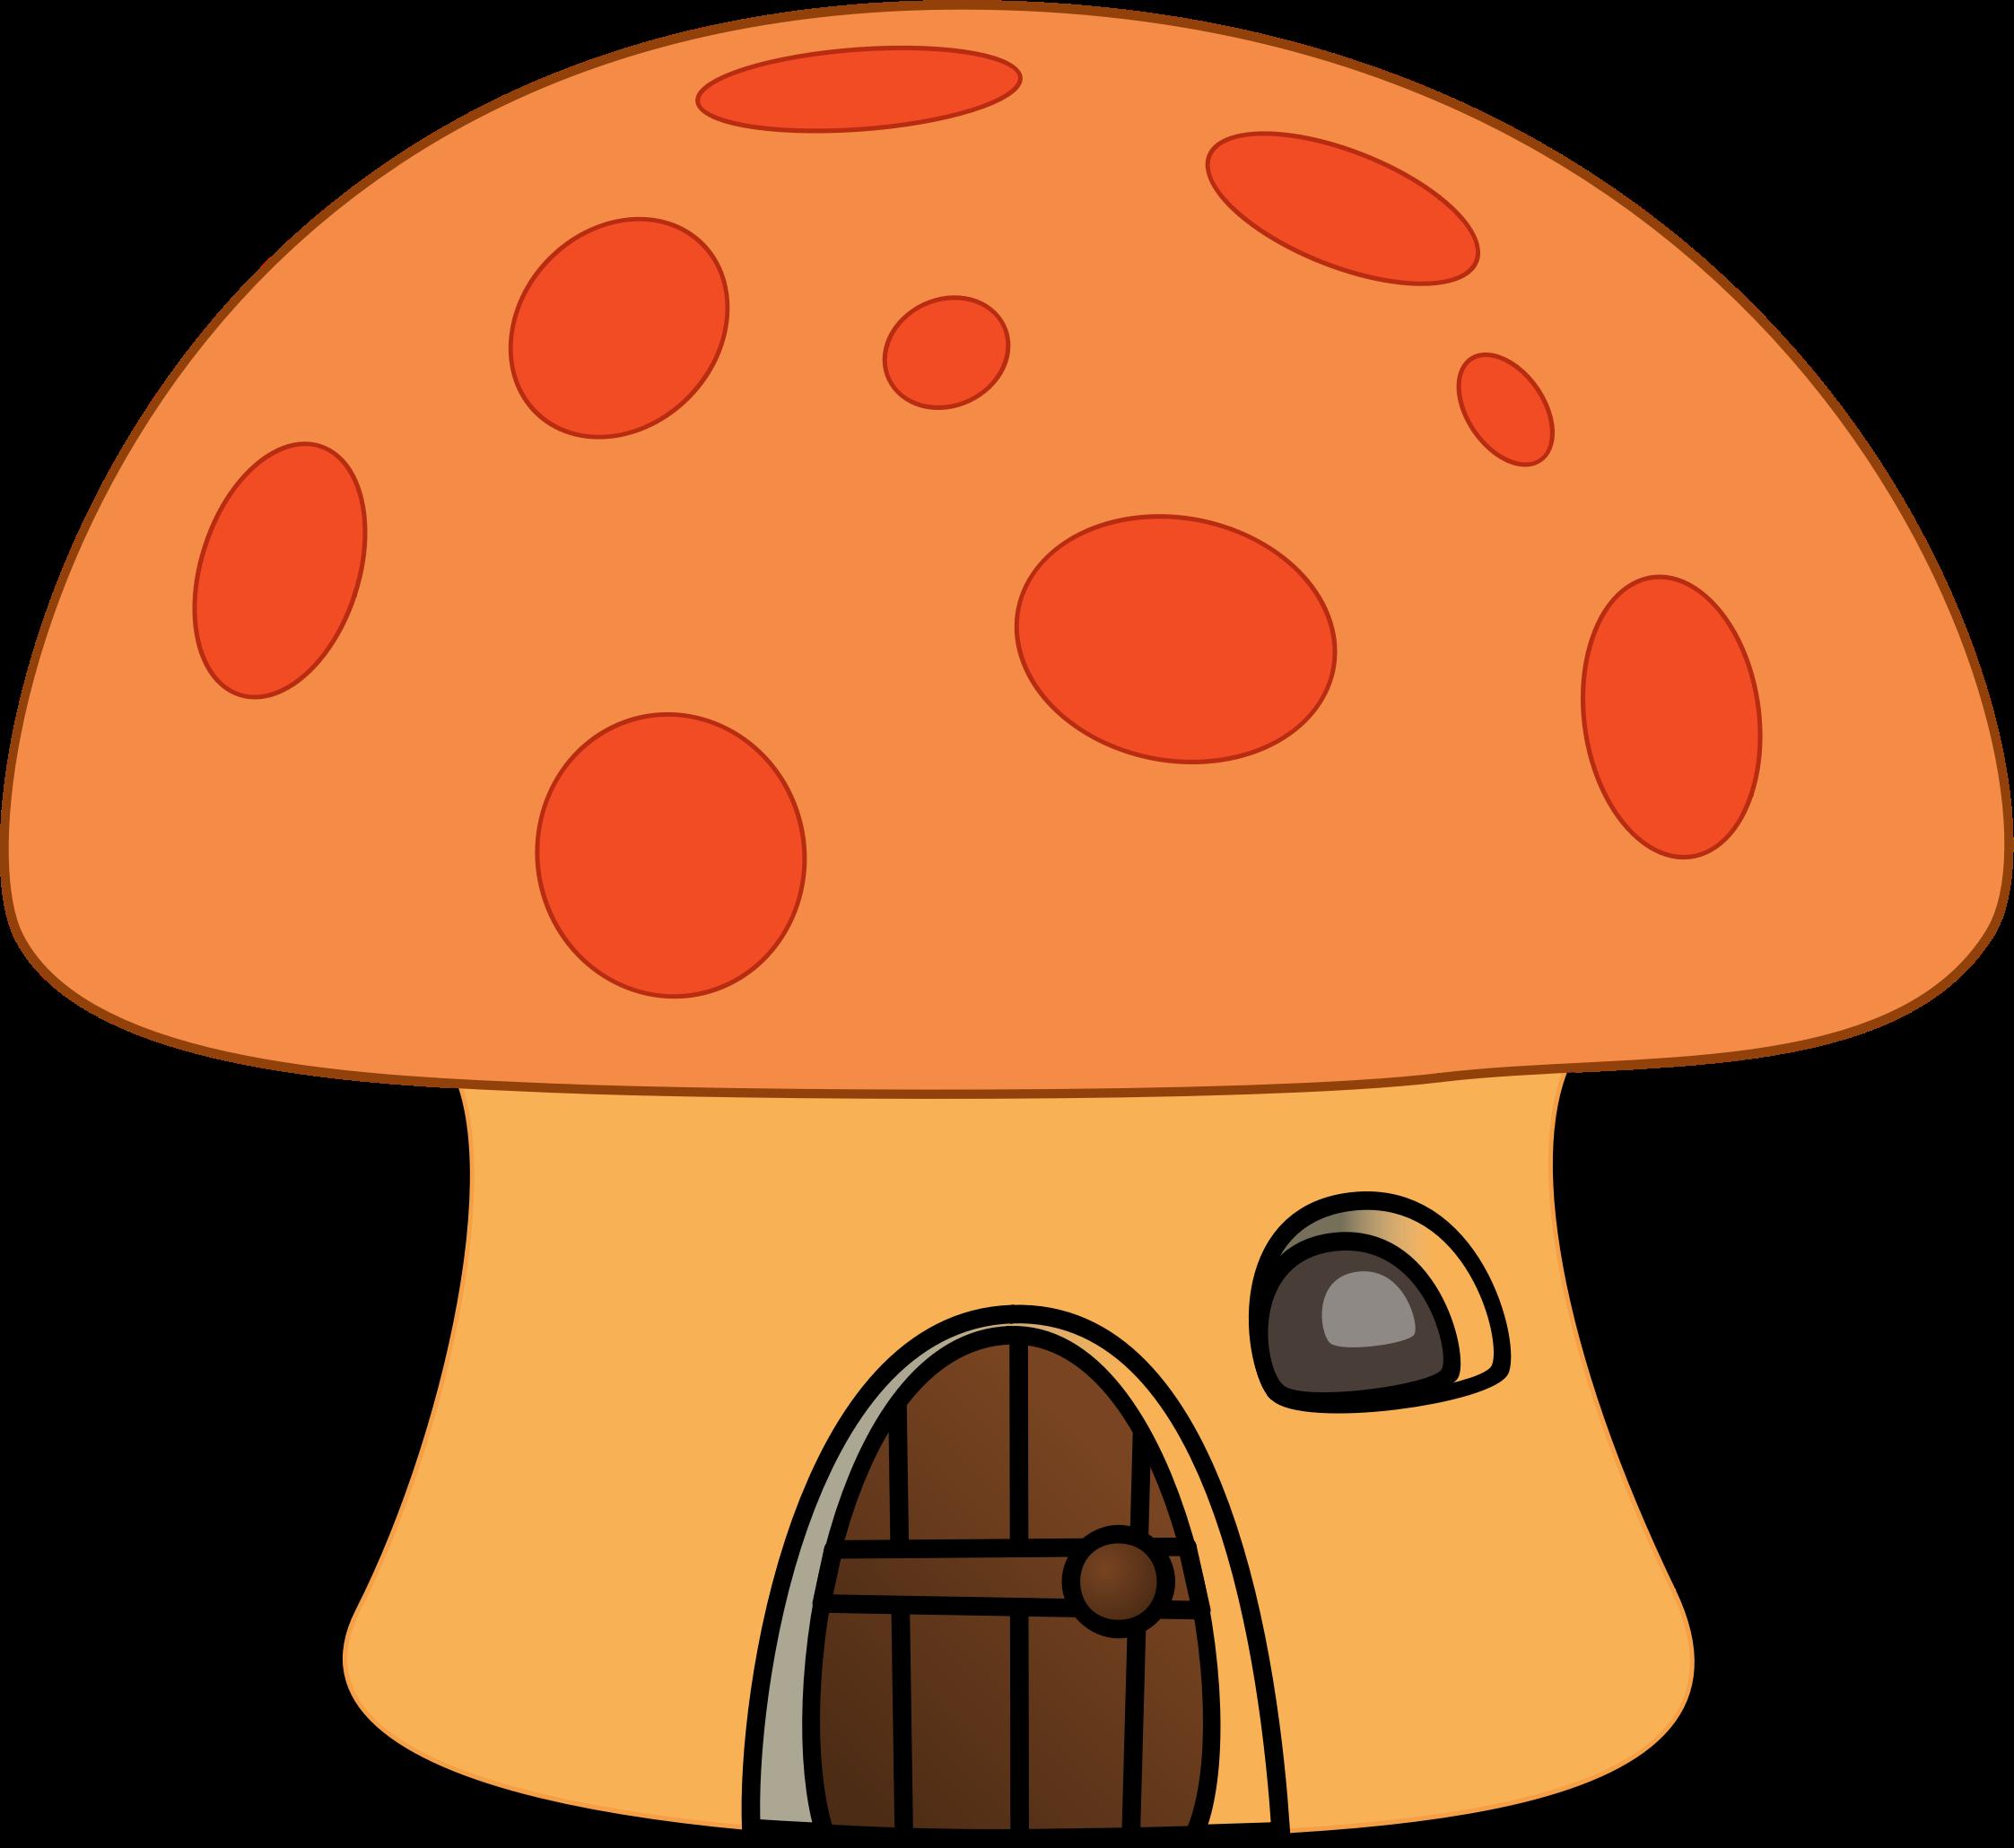 mushrooms clipart mushroom home